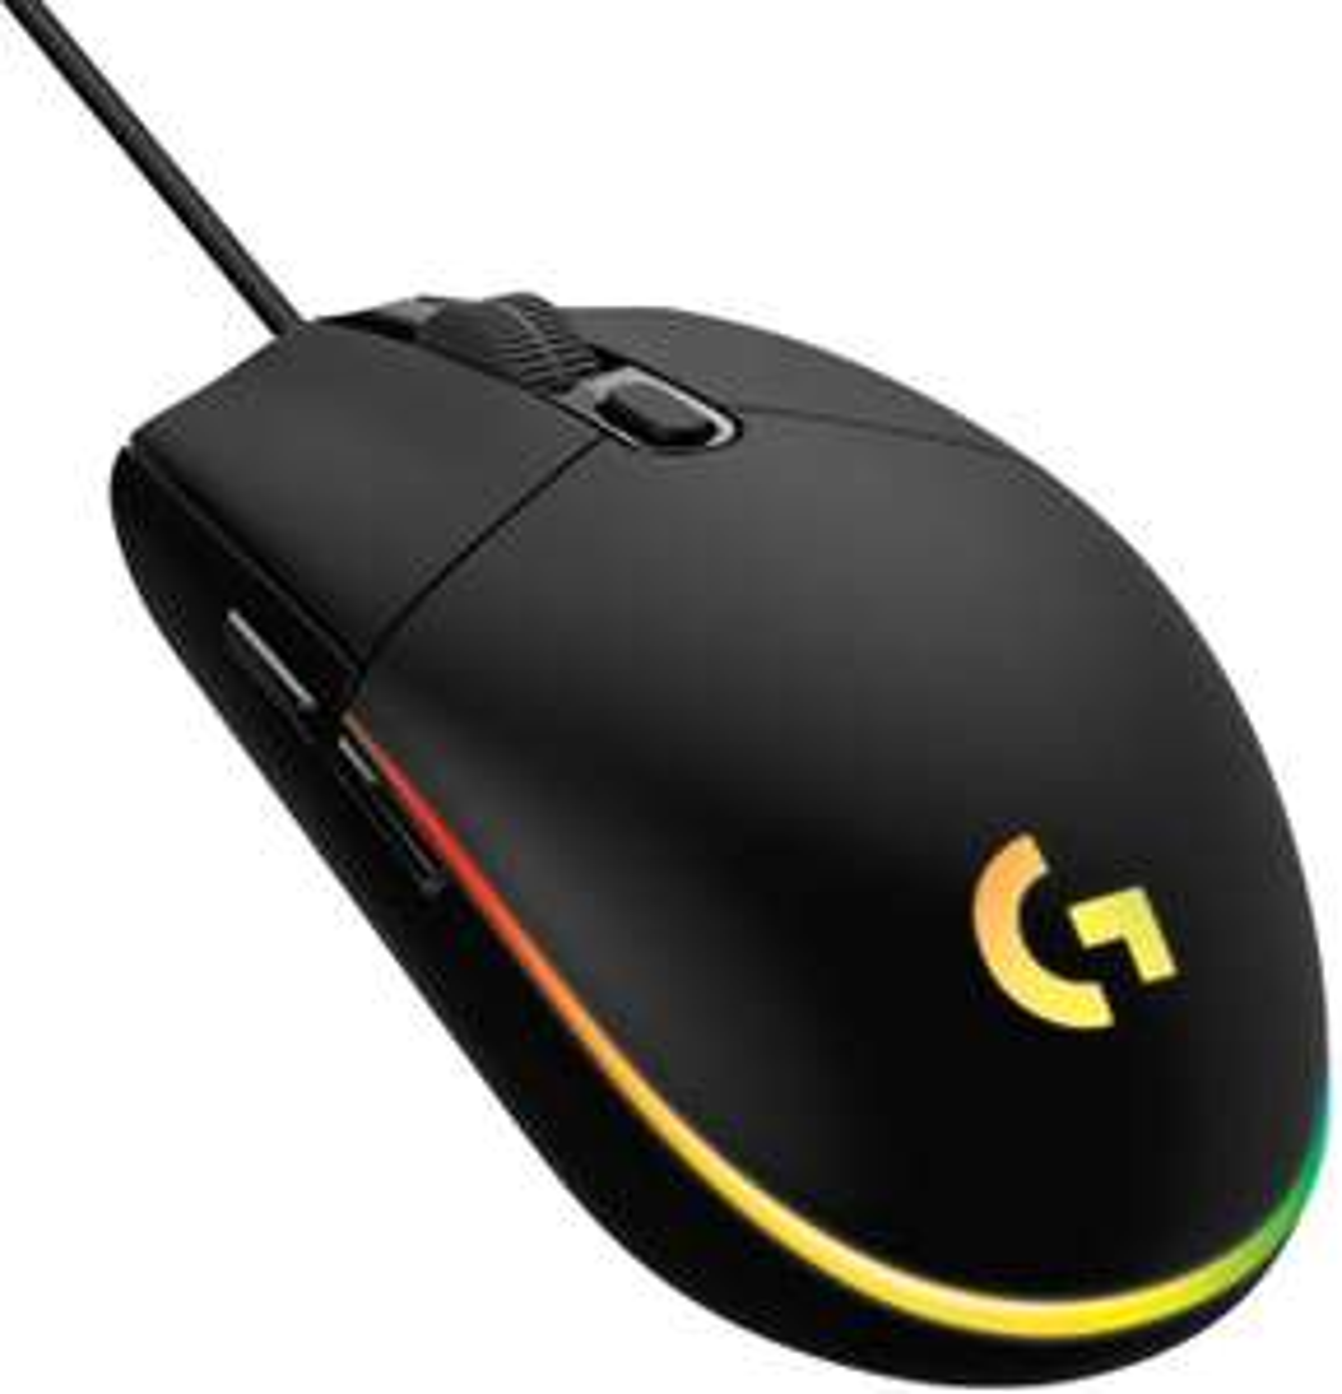 Logitech G203 Lightsync Gaming Mouse met Aanpasbare RGB-verlichting